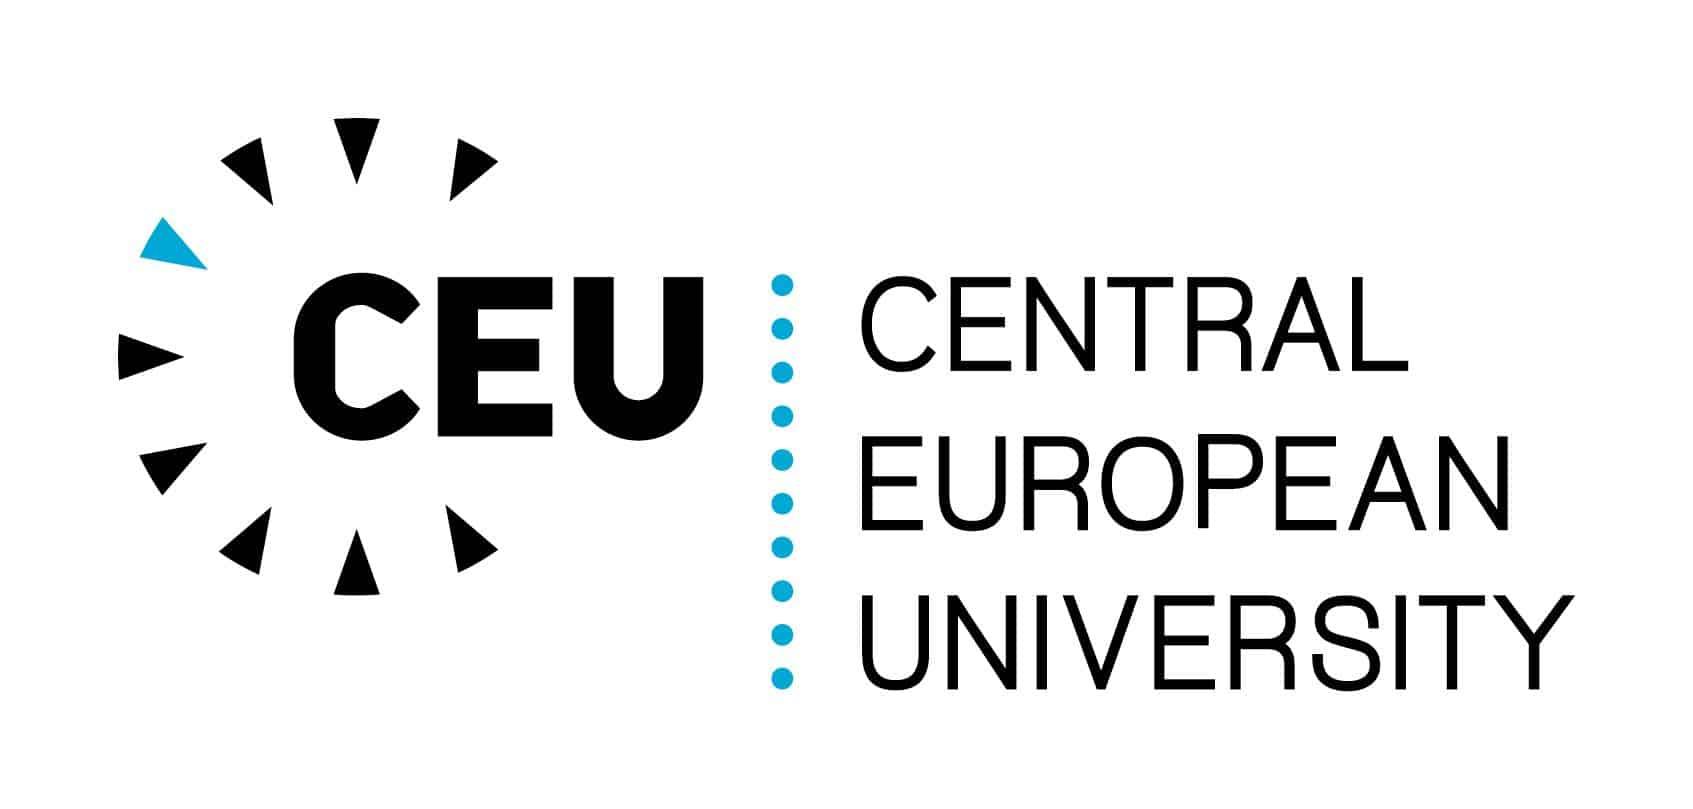 Central European University Private University